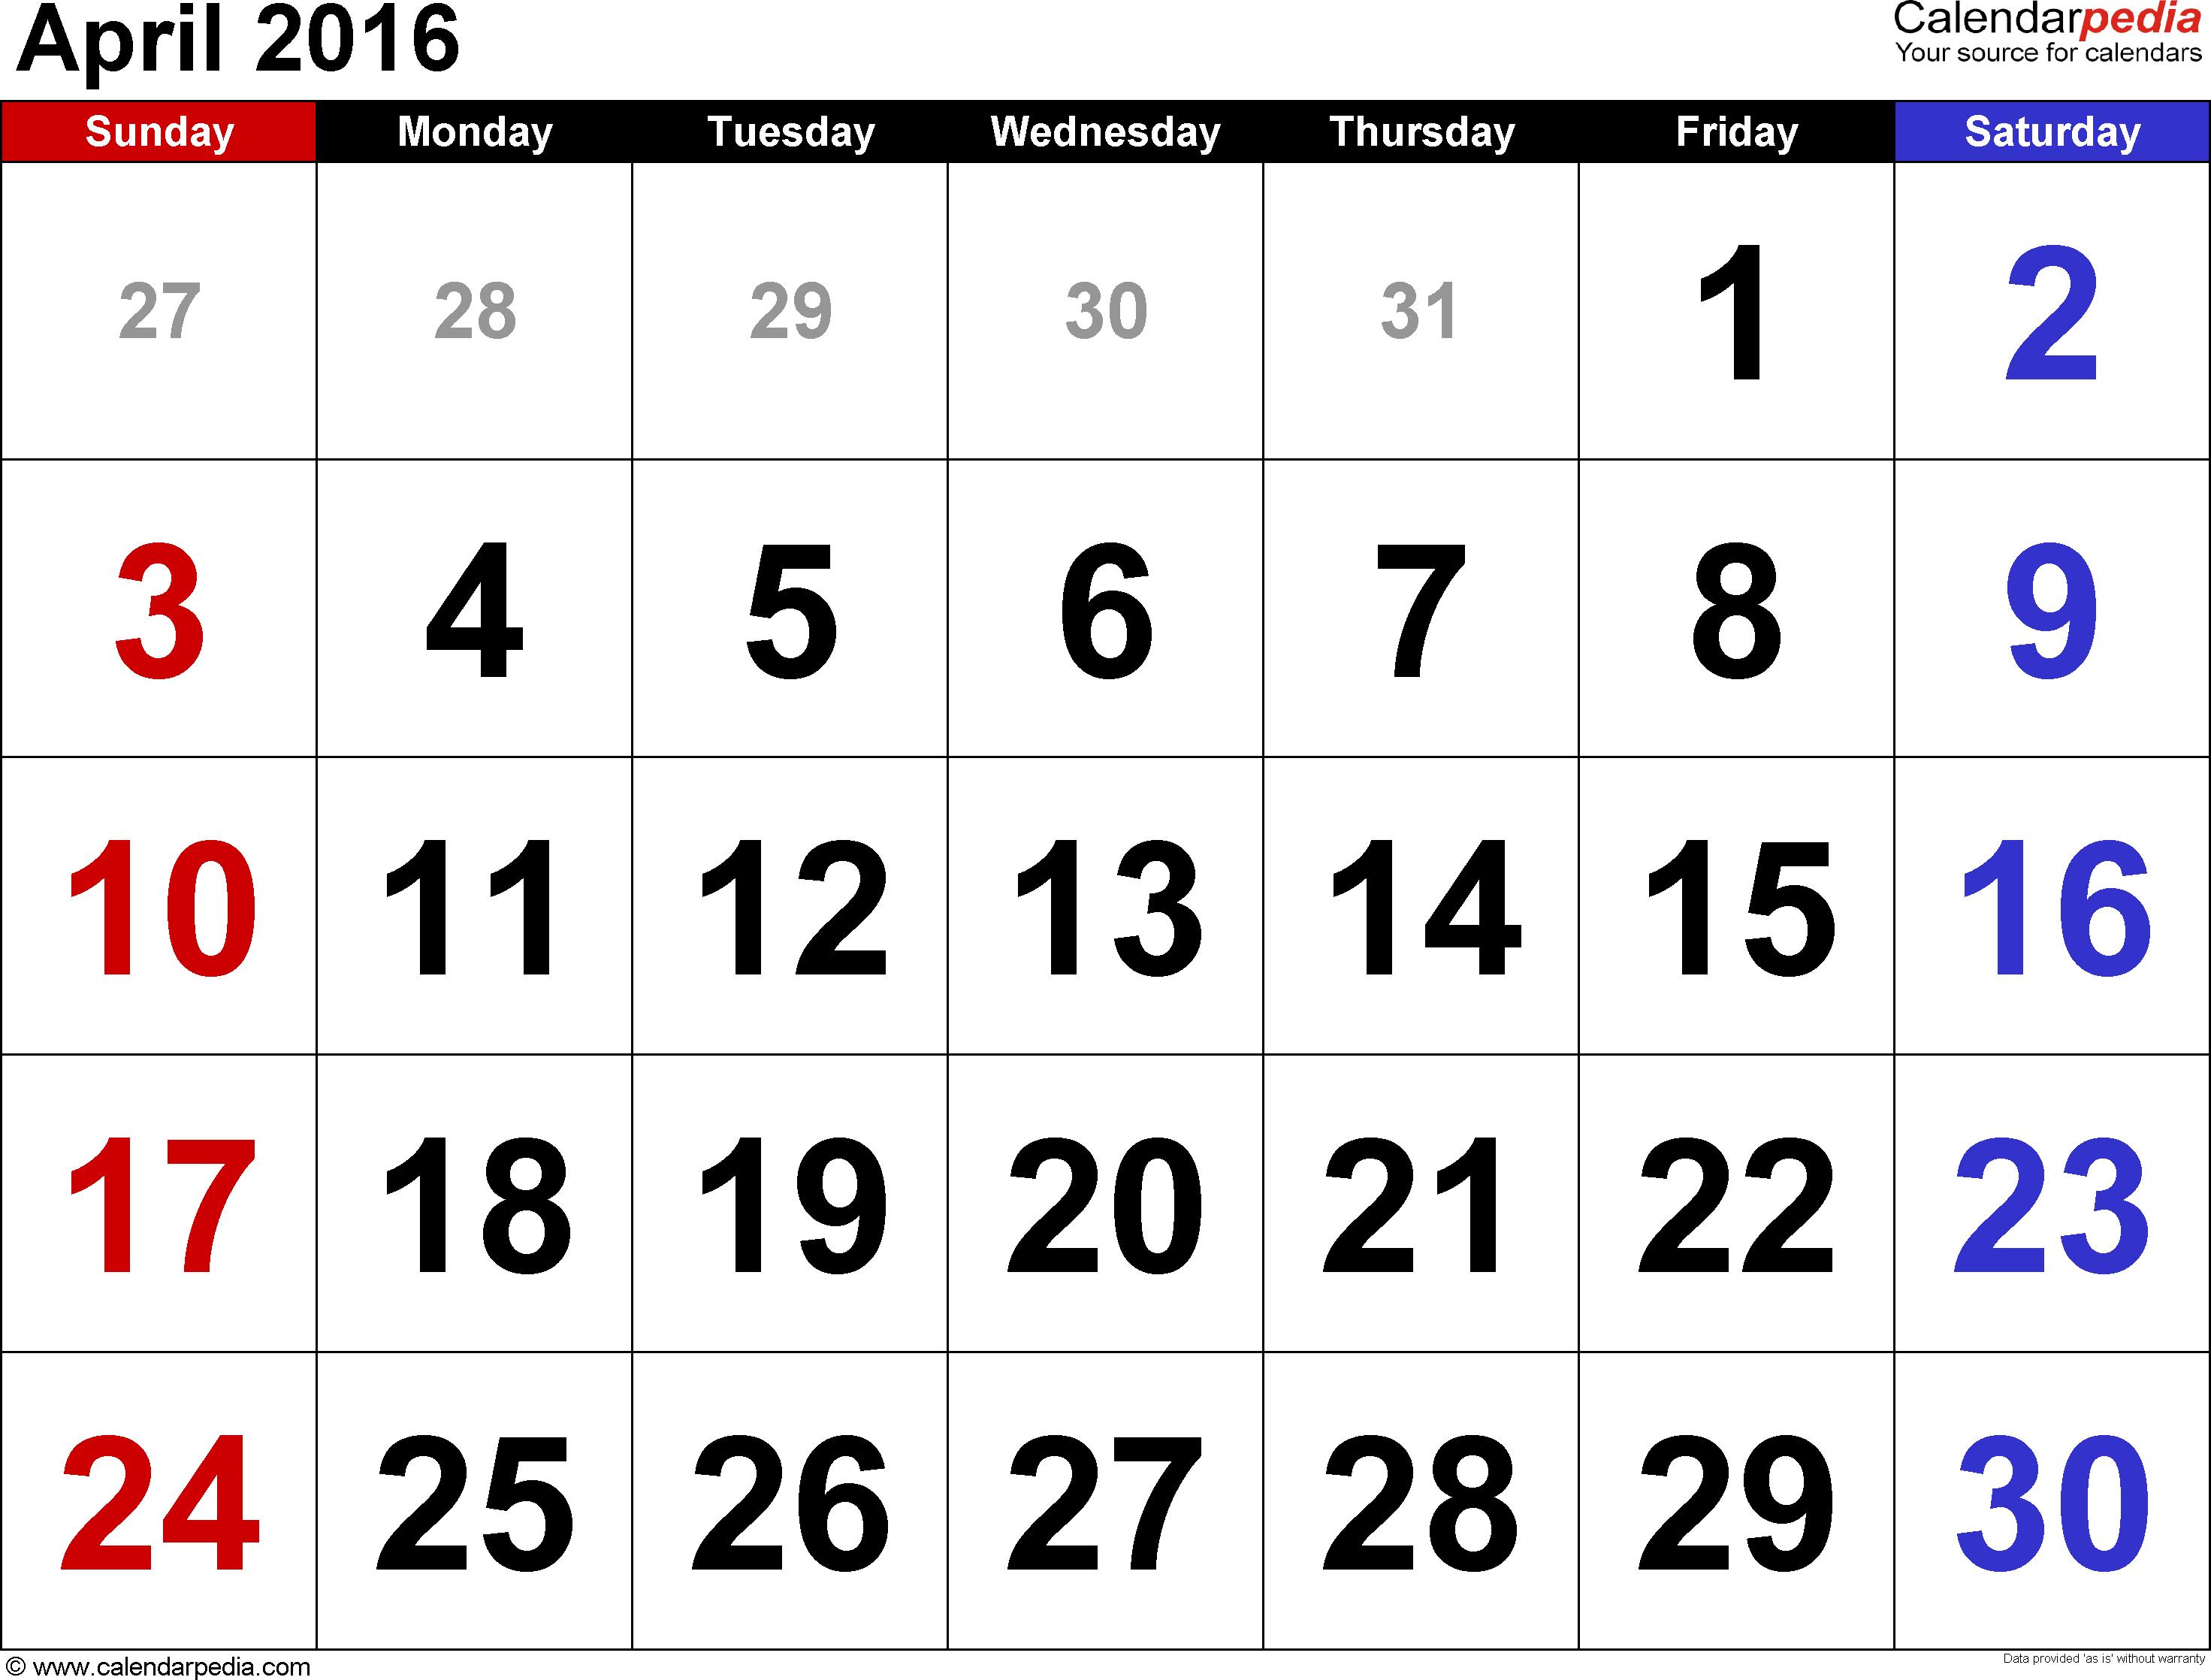 April 2016 calendar - Calendar April PNG